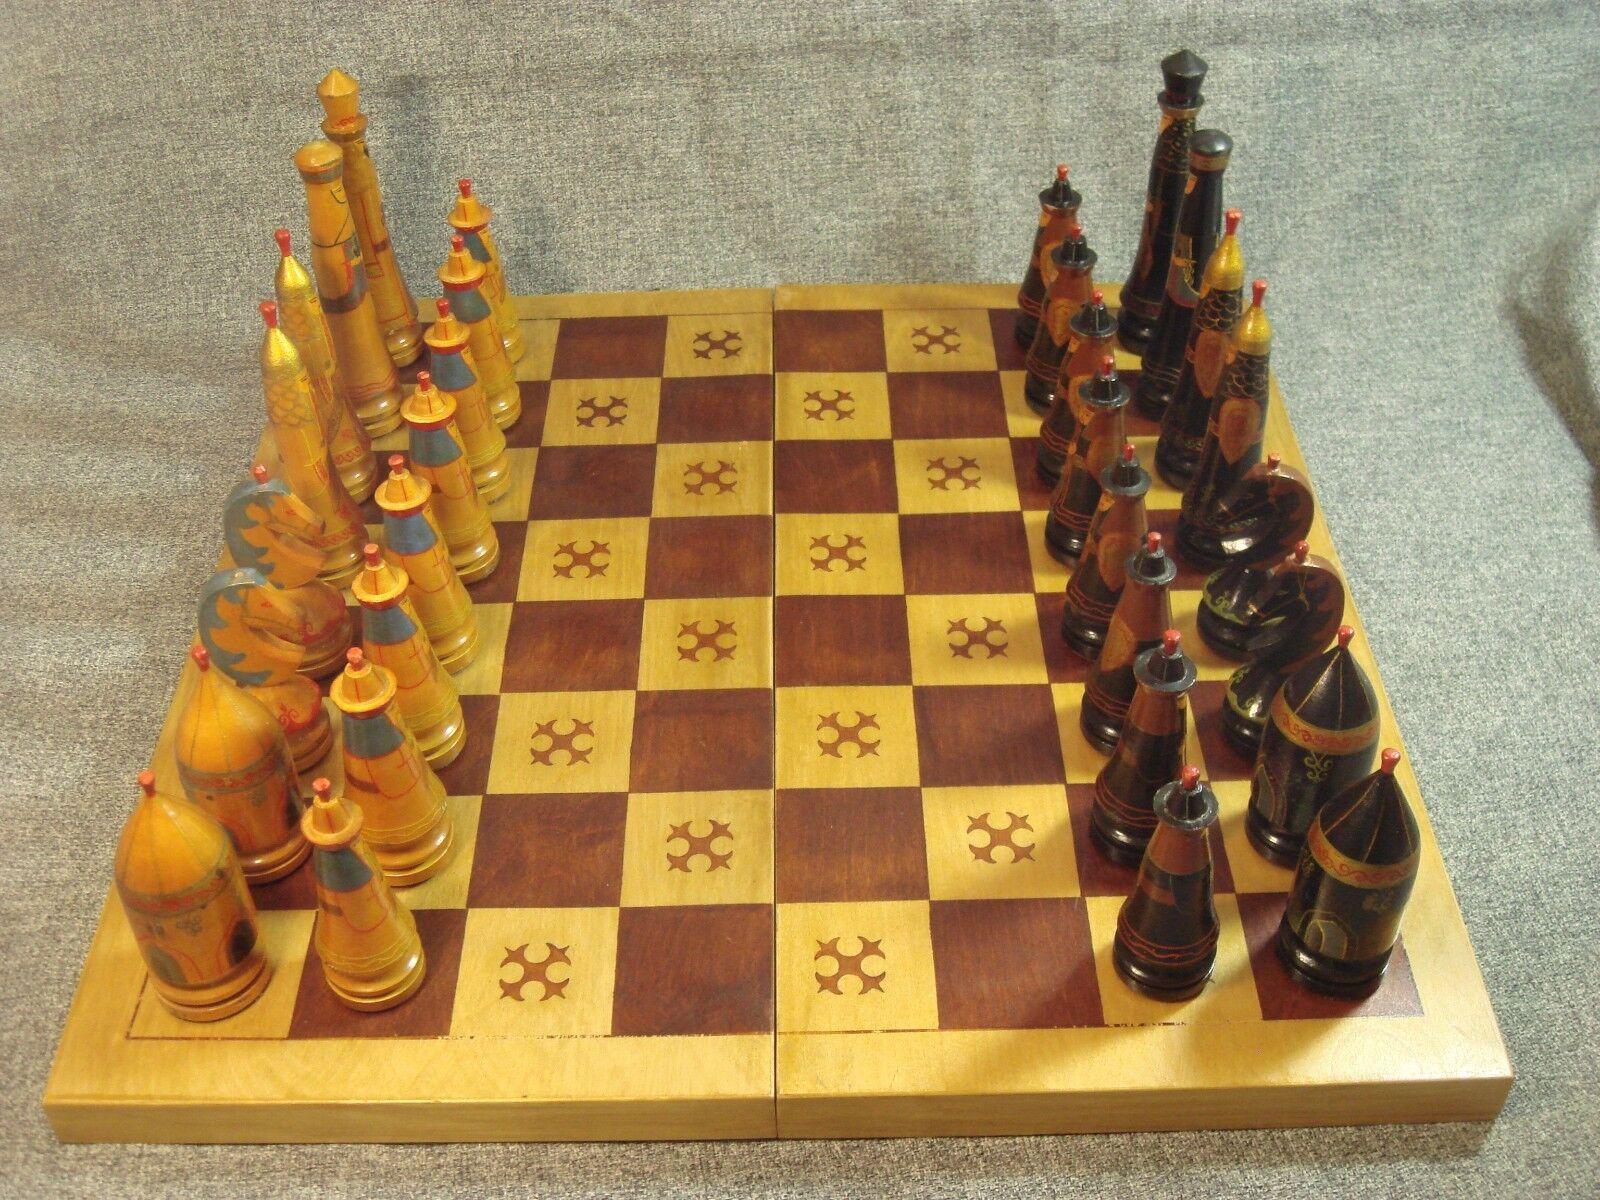 Vintage Soviet USSR Chess tavola  with Asian cifras 876  la migliore offerta del negozio online